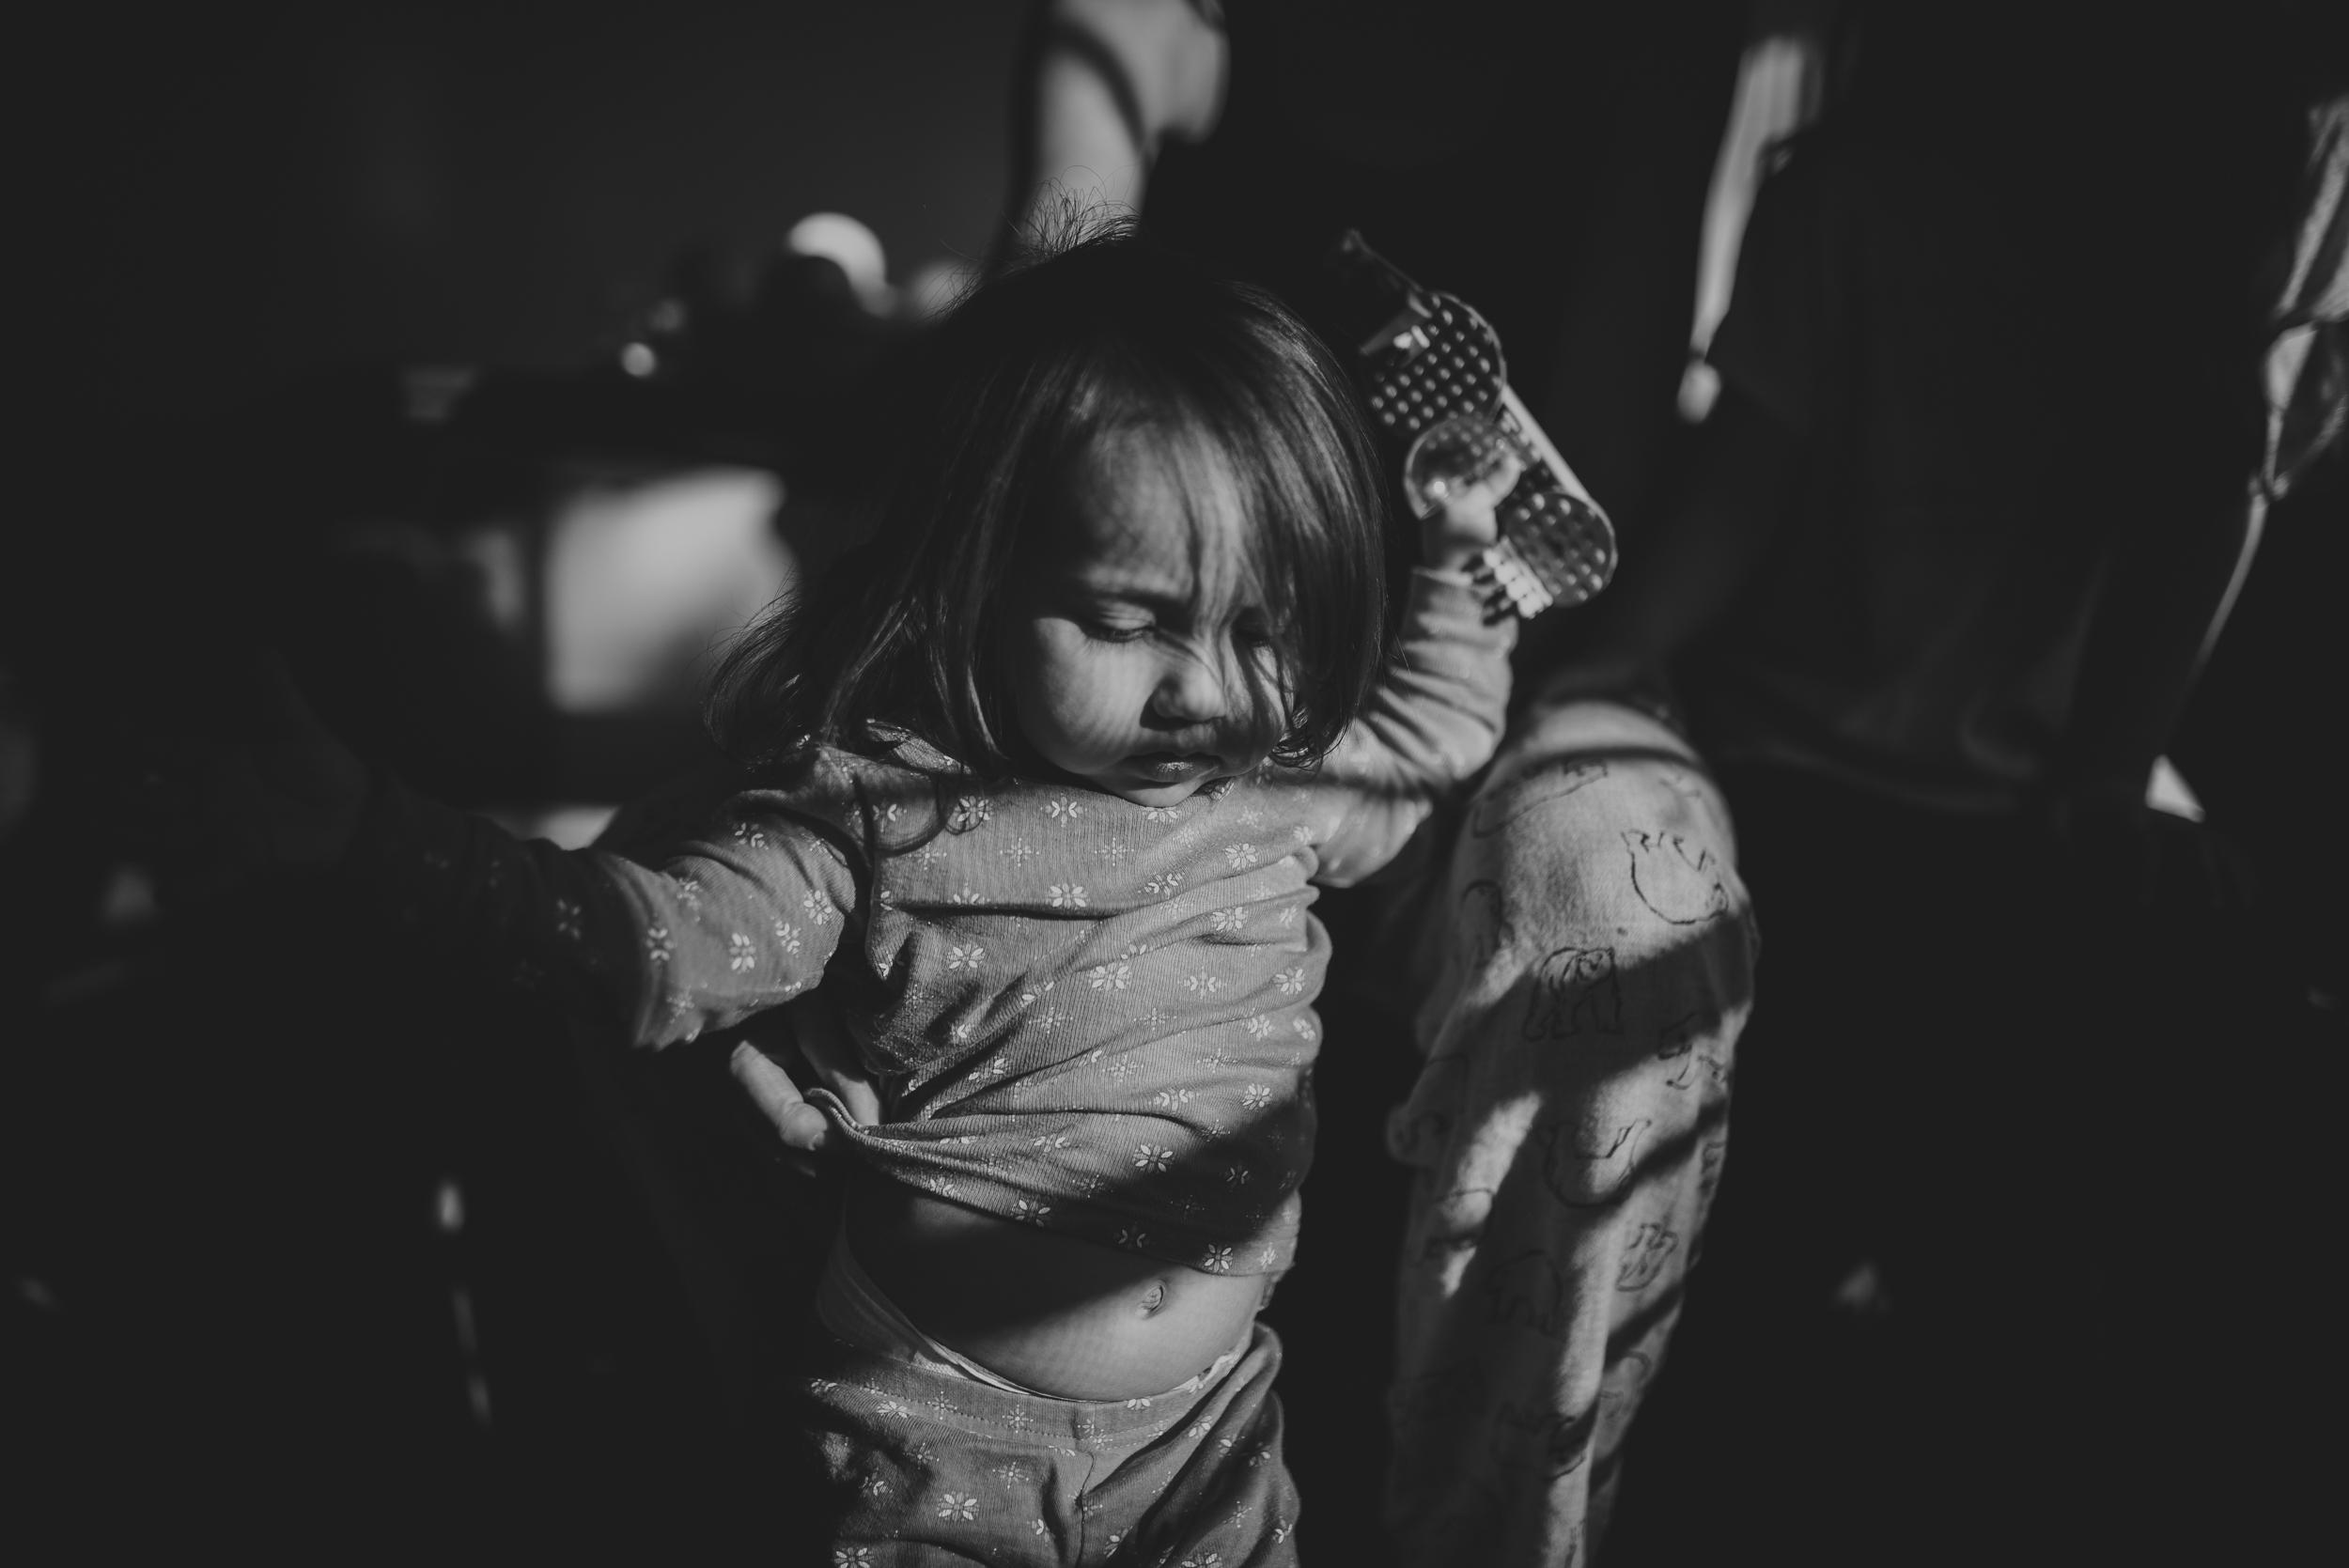 2018-San-Diego-Family-Lifestyle-Newborn-Travel-Vacation-Photographer-Kelsey-Smith-Photography-Coronado-La-Jolla-Encinitas-Solana-Beach-Del-Mar-285.jpg